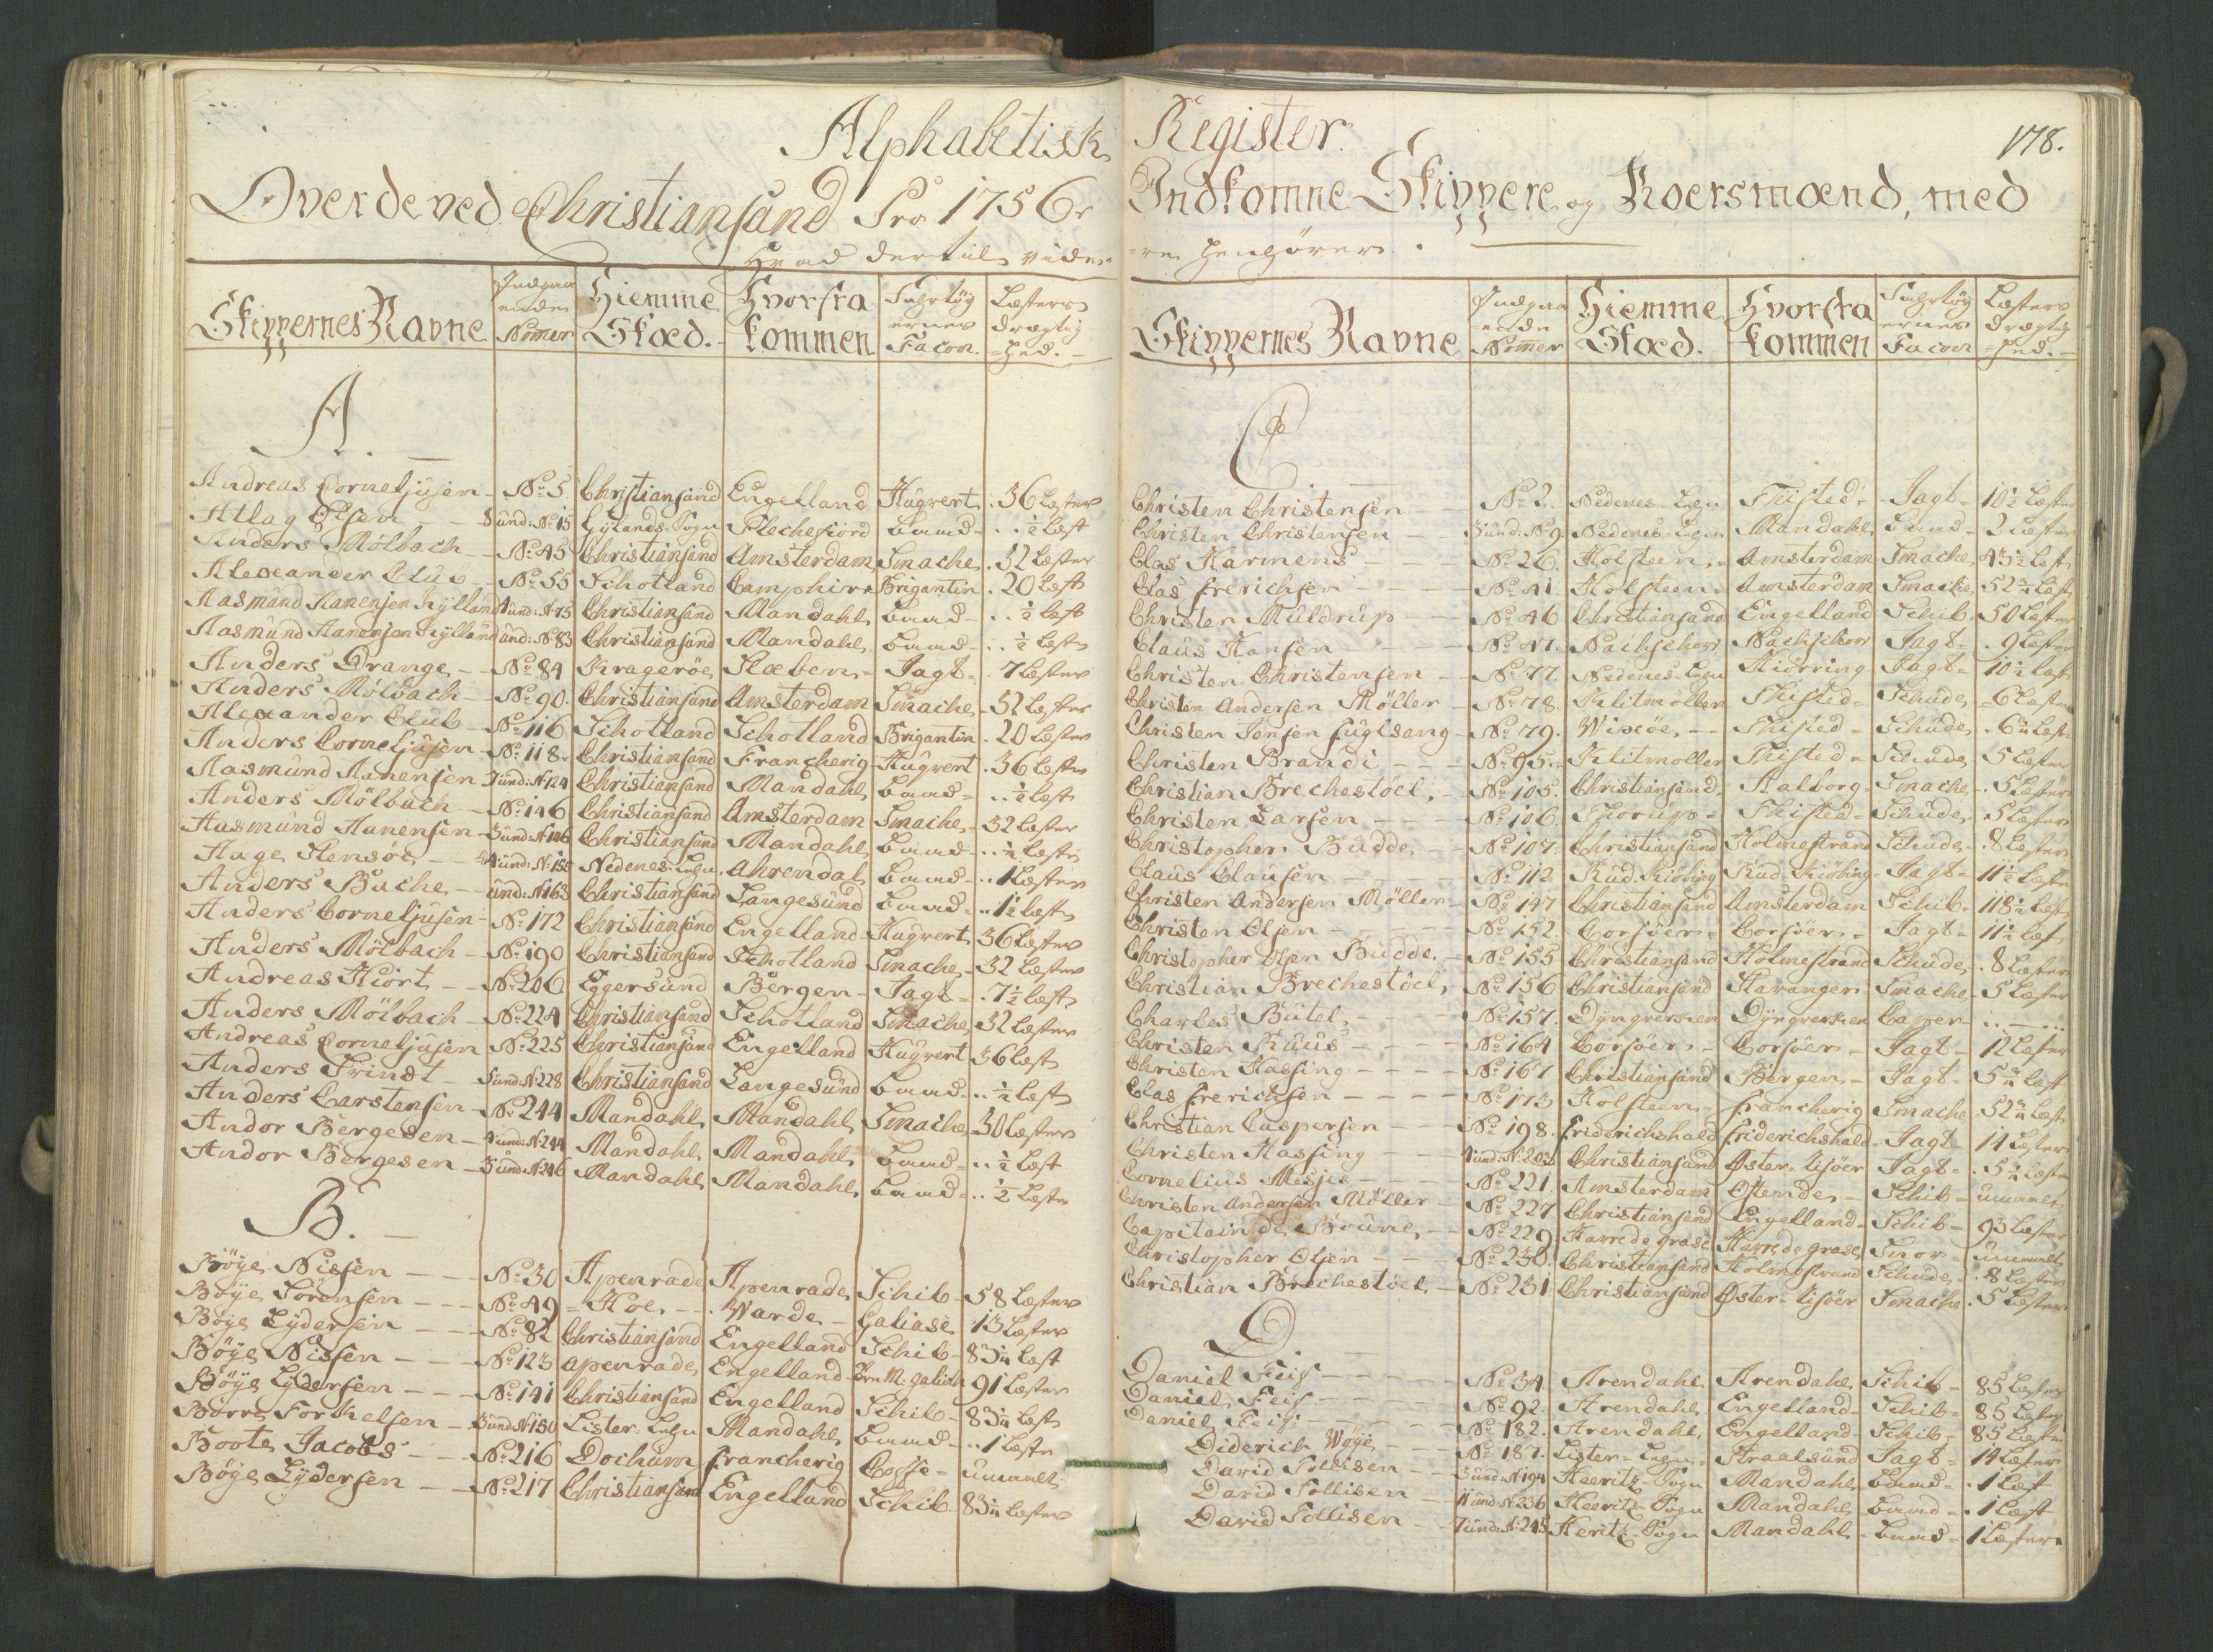 RA, Generaltollkammeret, tollregnskaper, R16/L0033: Tollregnskaper Kristiansand, 1756, s. 177b-178a